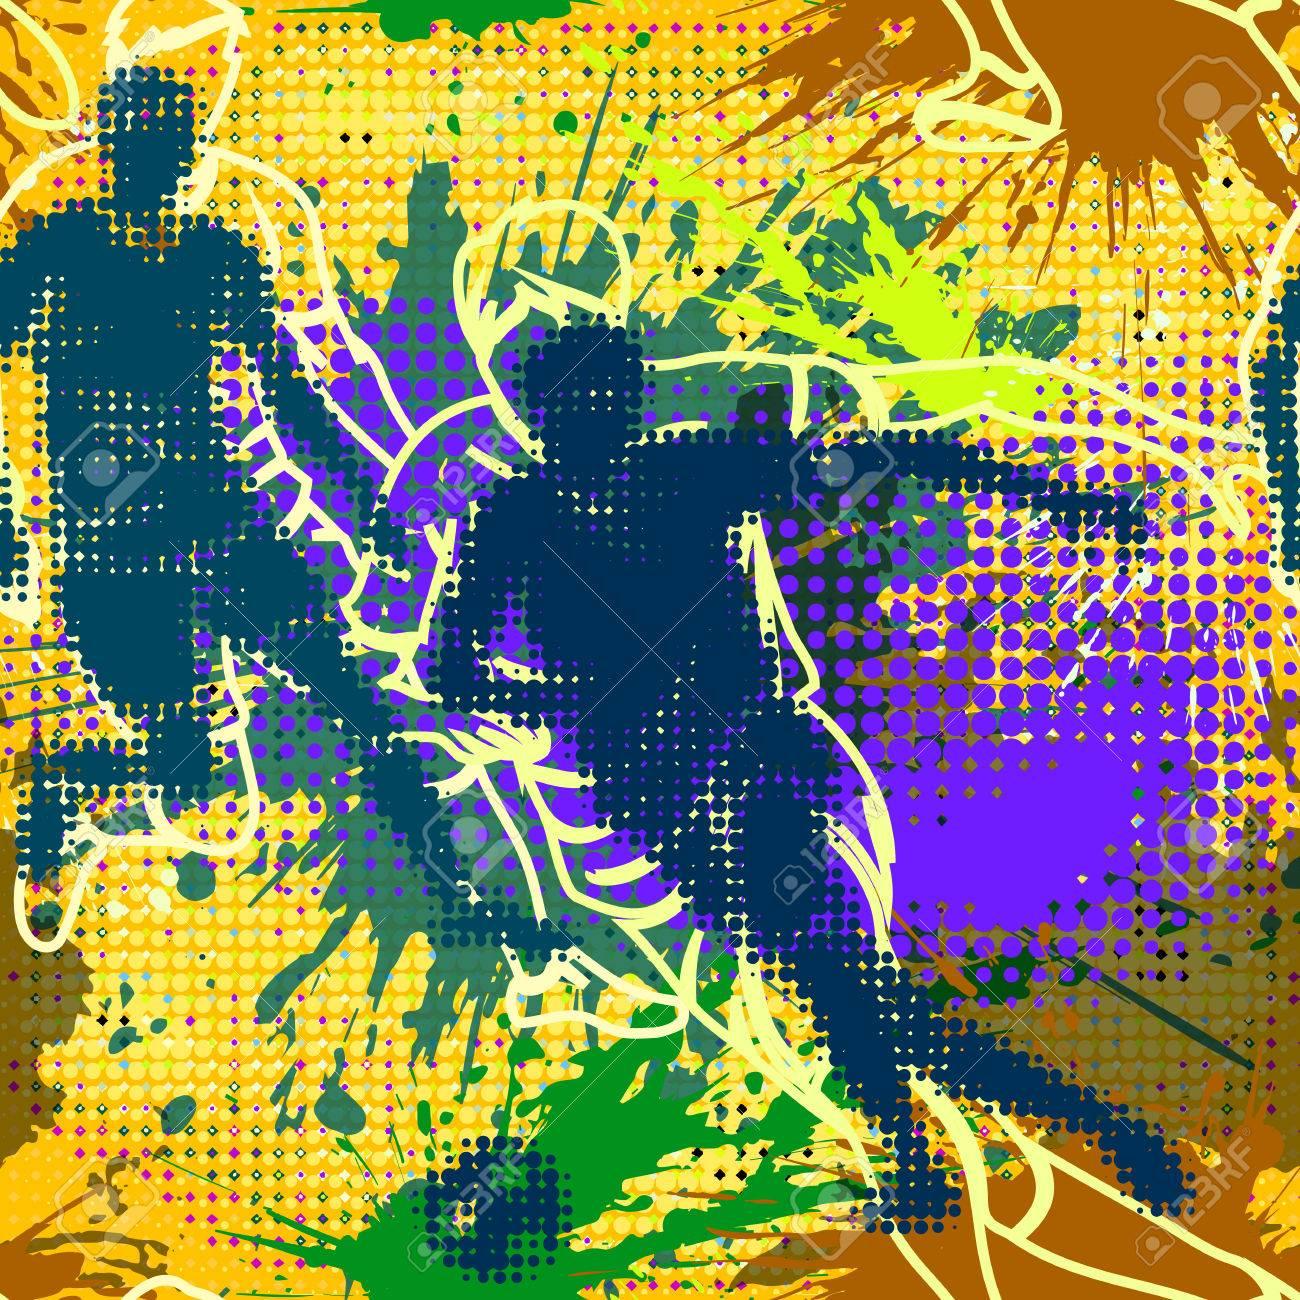 Graffiti Style Seamless Pattern With Grunge Effect Abstract